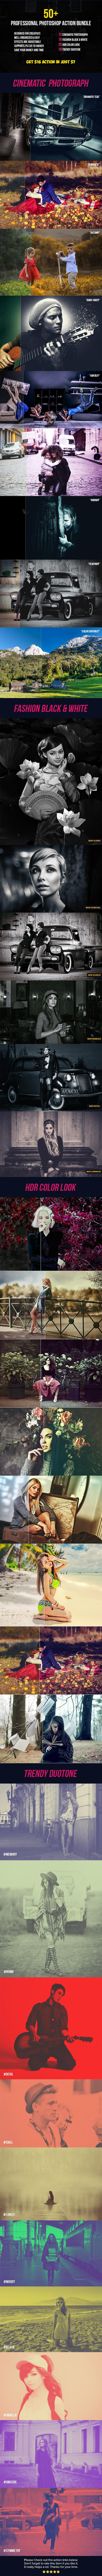 50+ Pro Photoshop Bundle - Photo Effects Actions